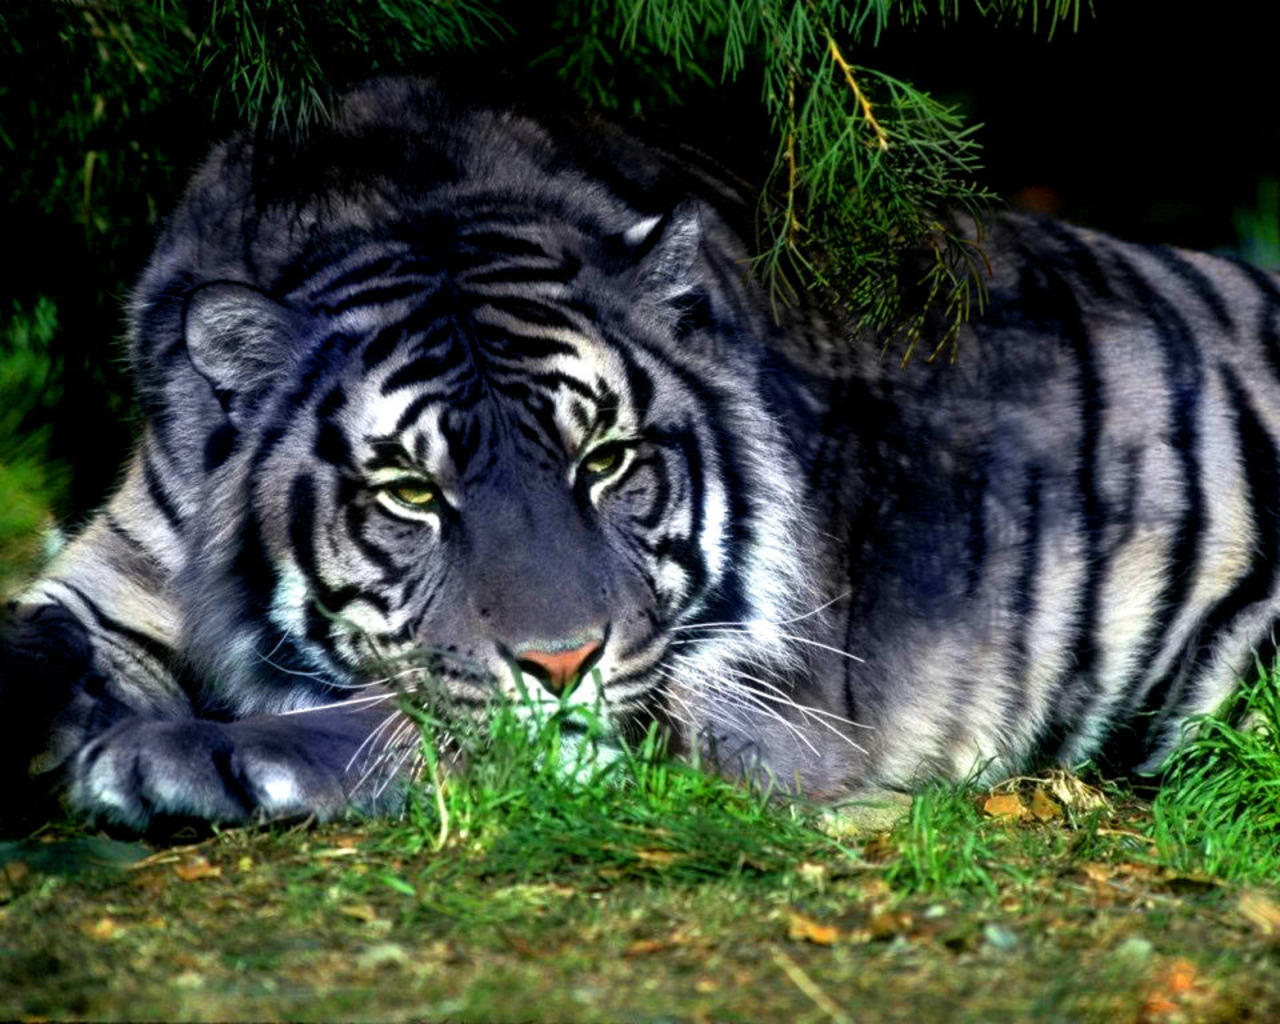 Картинка Синий тигр » Тигры » Животные ...: www.kartinki24.ru/kartinki/tigers/1207-kartinka-12.html